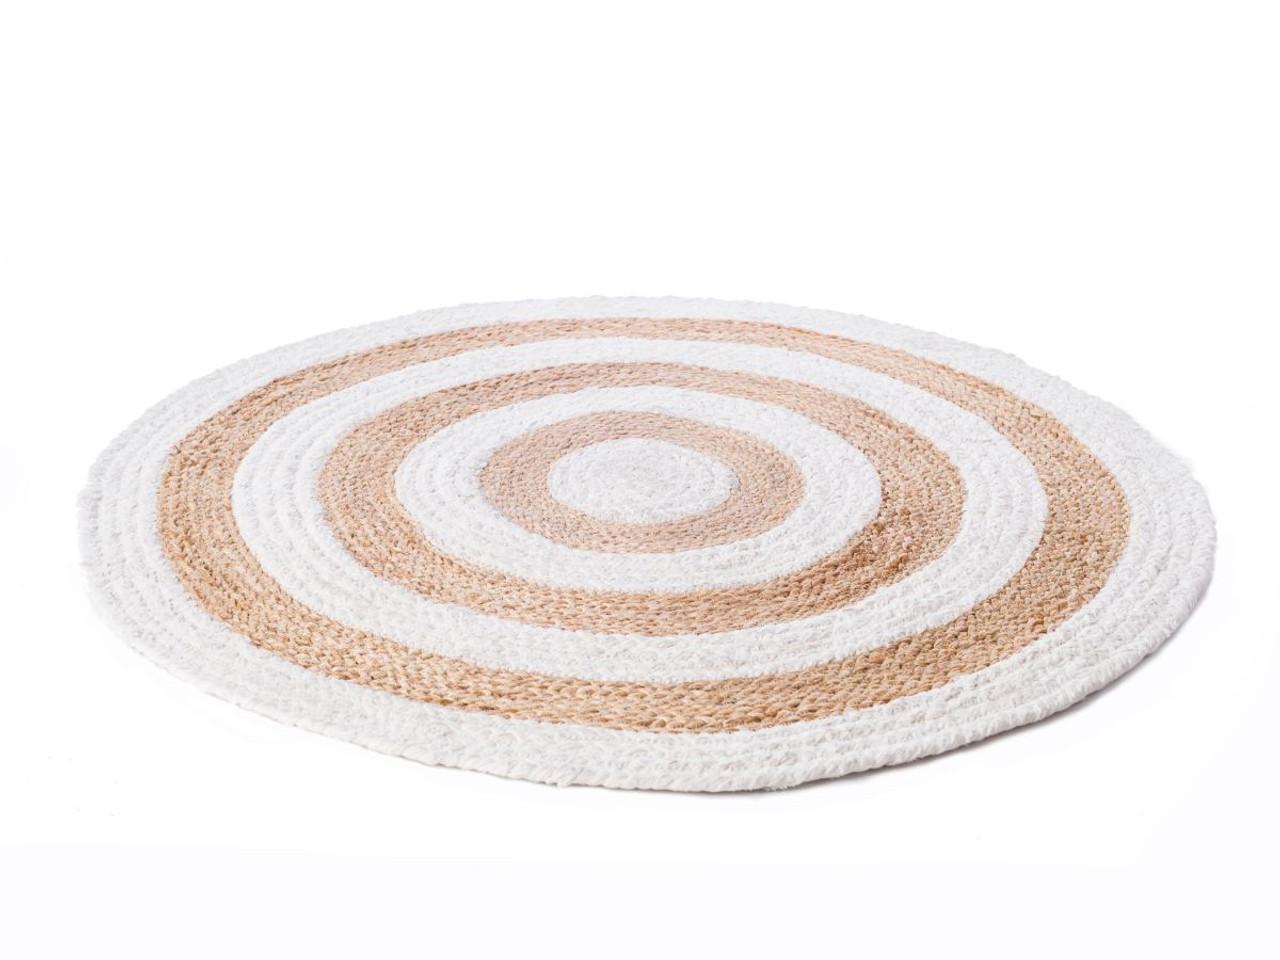 Mocka Circa Rugs Woven Rug Floor Mat Round Rugs Black Rugs White Rugs Denim Rugs Bedroom Decor Interior Decor Contemporary Decor Home Decor Soft Furnishings Rugs